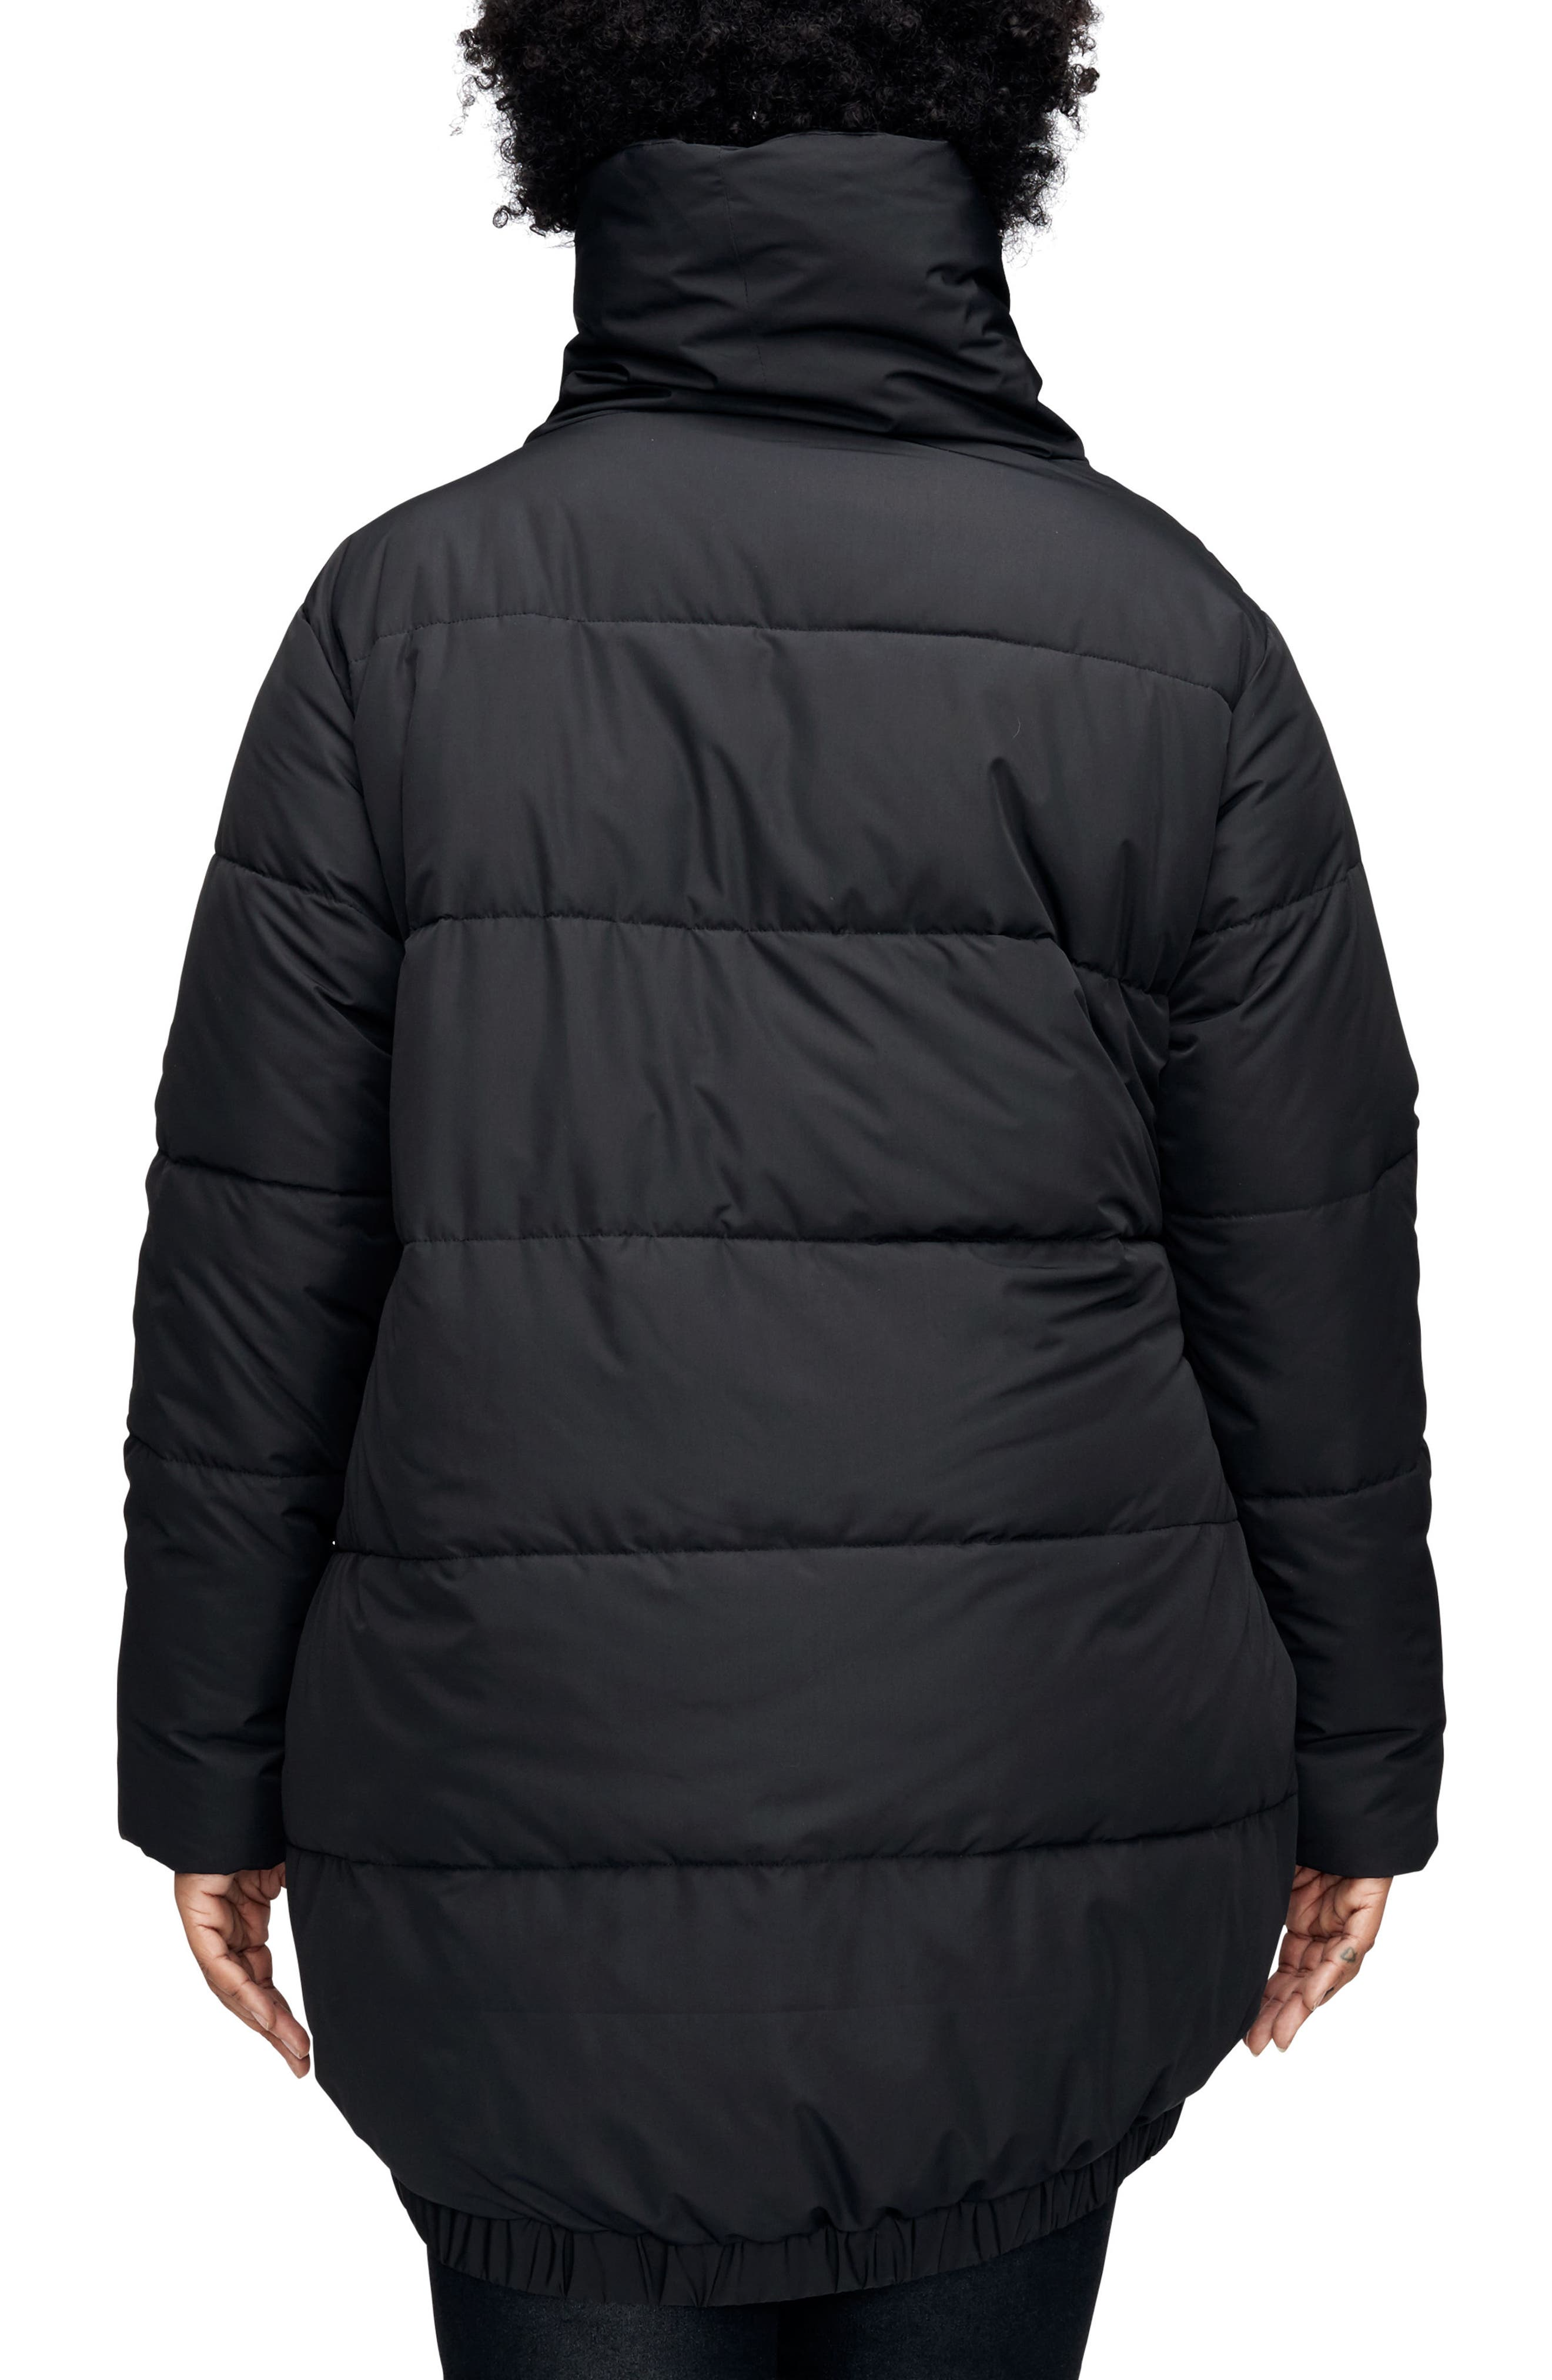 UNIVERSAL STANDARD, Kanda Puffer Coat, Alternate thumbnail 2, color, BLACK